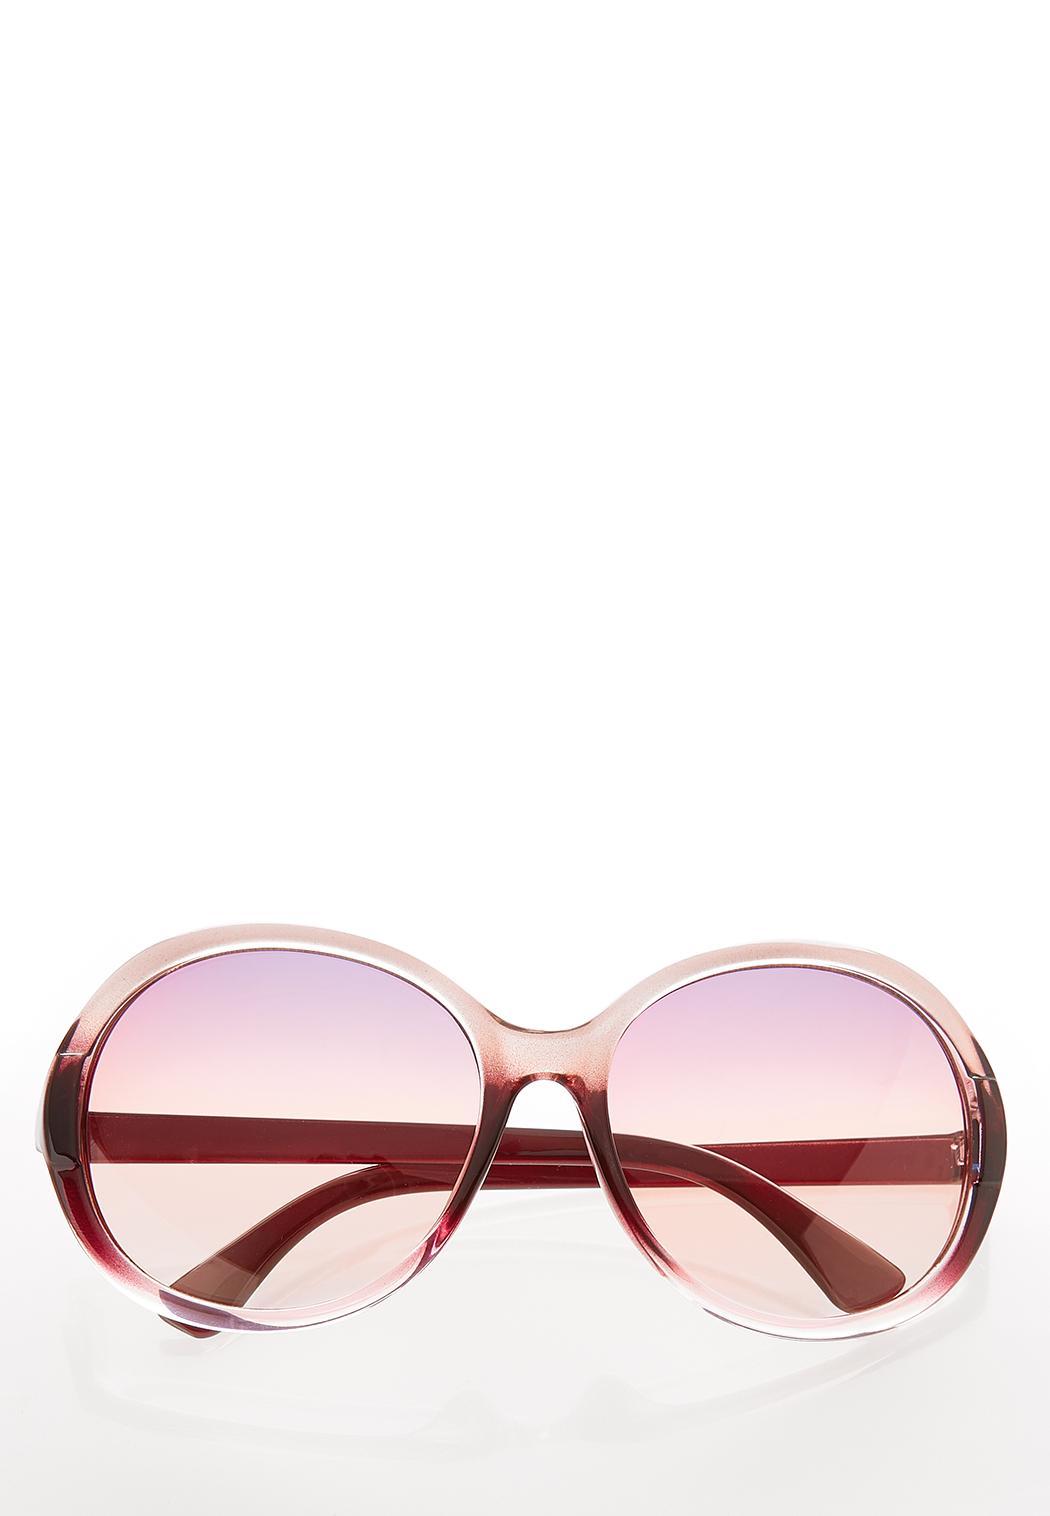 Ombre Rose Sunglasses